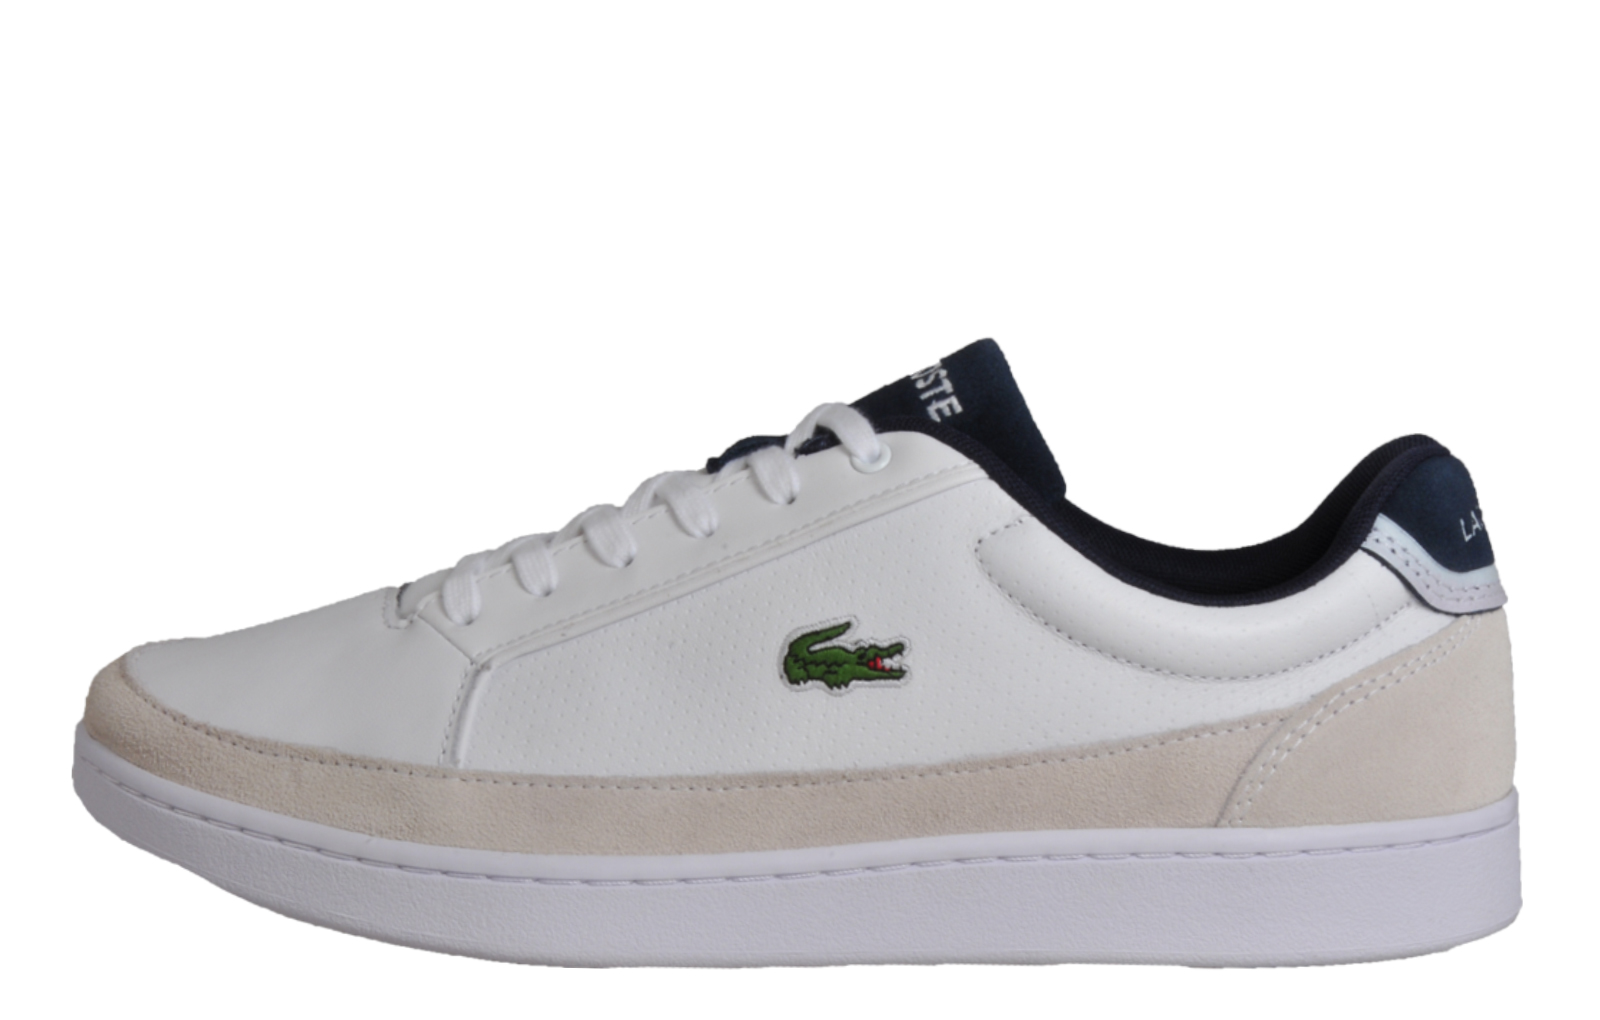 653f8a22c460 Lacoste Setplay 117 Men s Classic Designer Leather Retro Trainers White